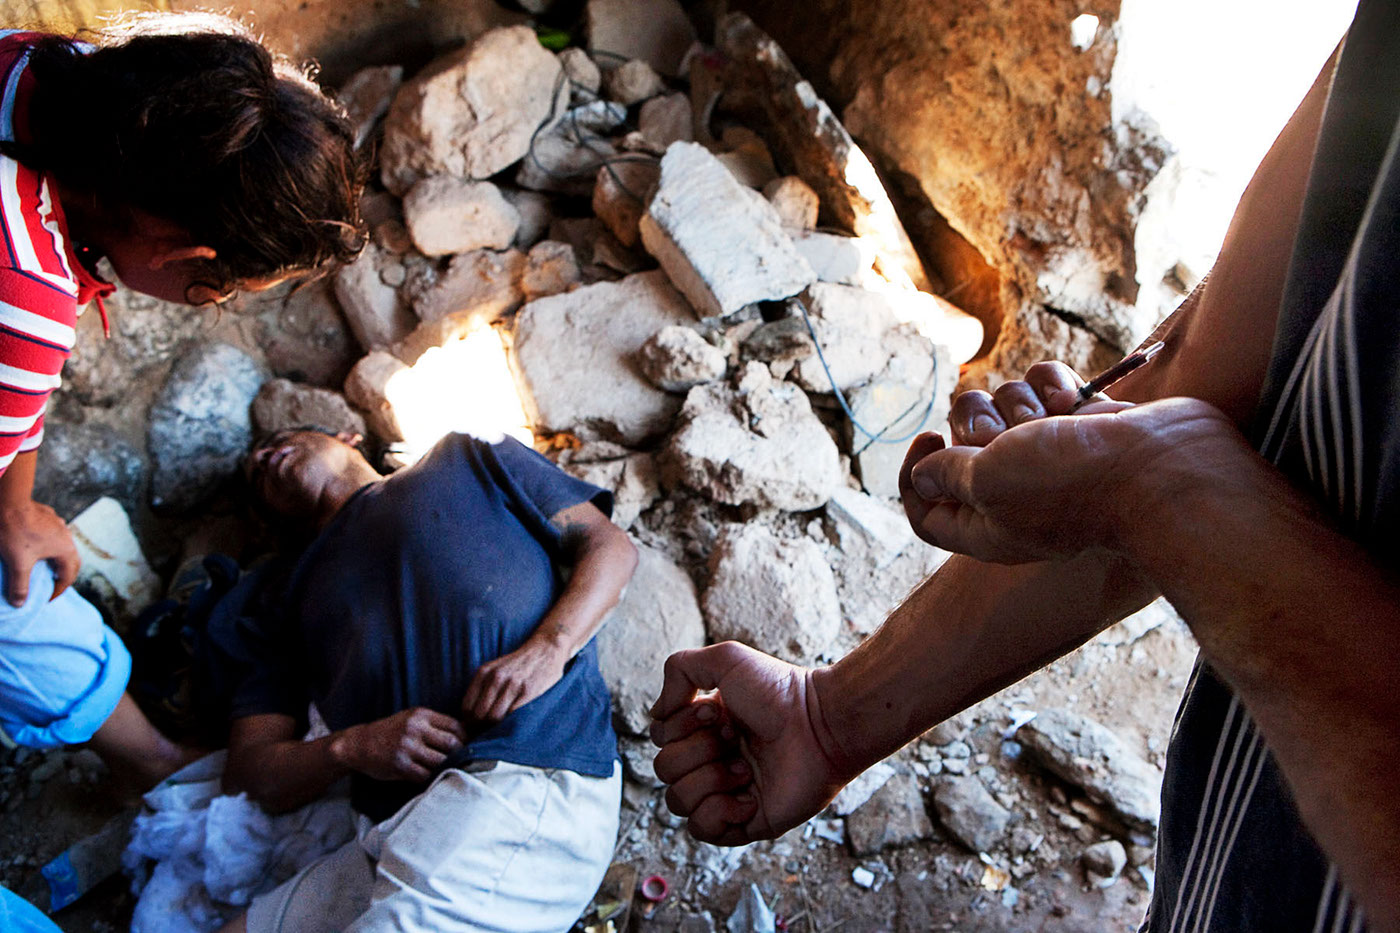 cuidad Juarez migration Drugs heroin border prostitution hiv